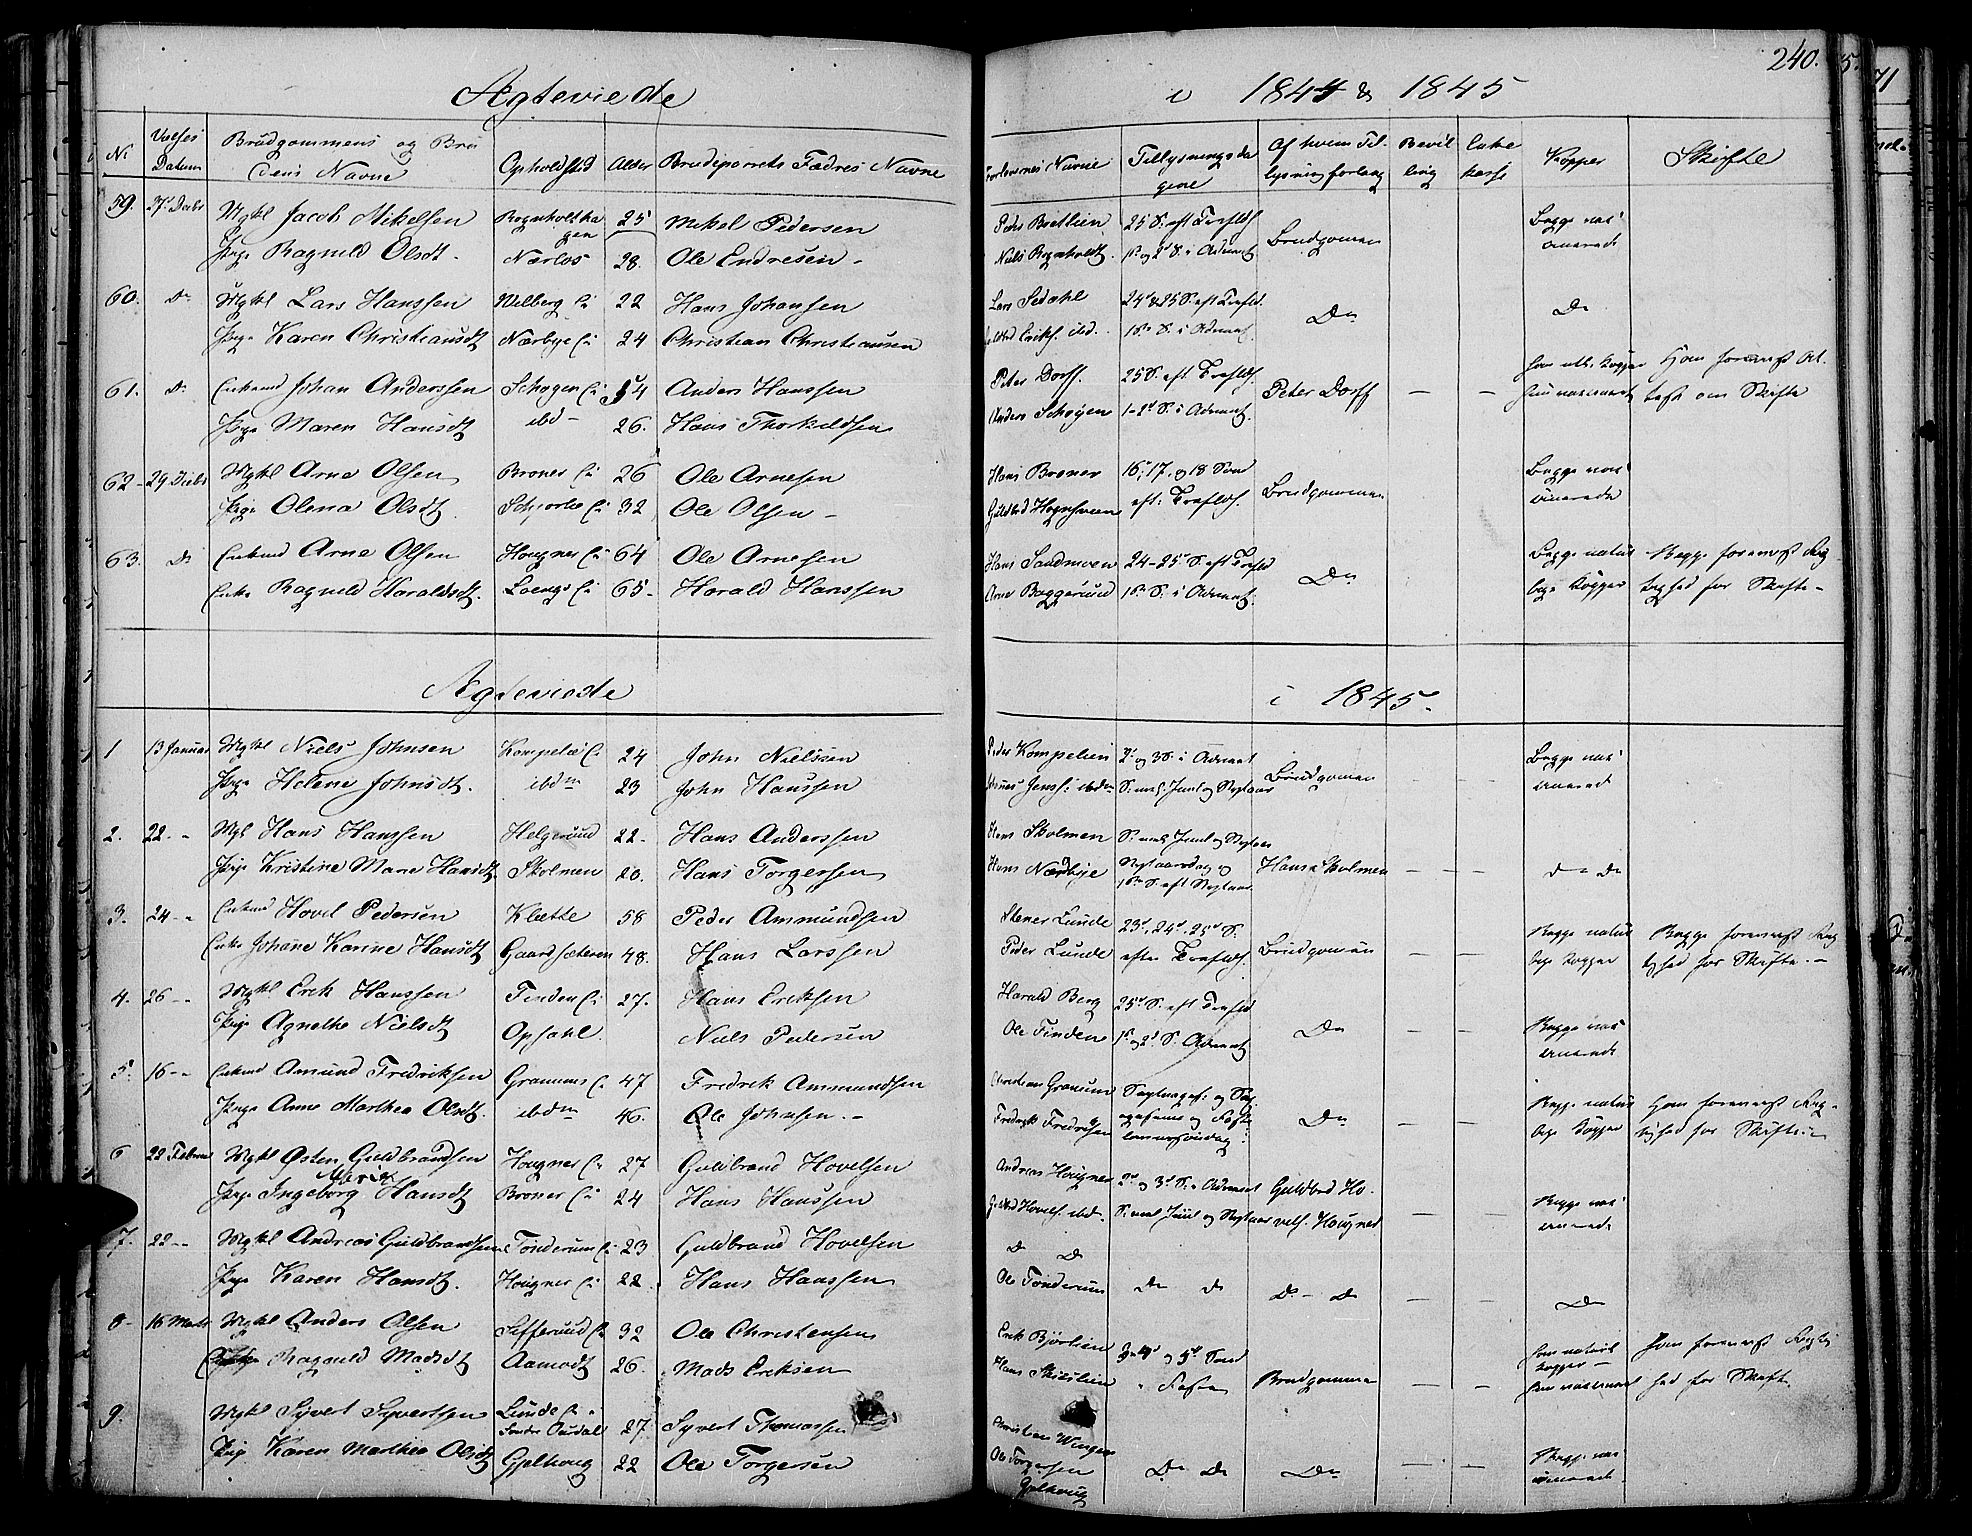 SAH, Land prestekontor, Ministerialbok nr. 8, 1830-1846, s. 240